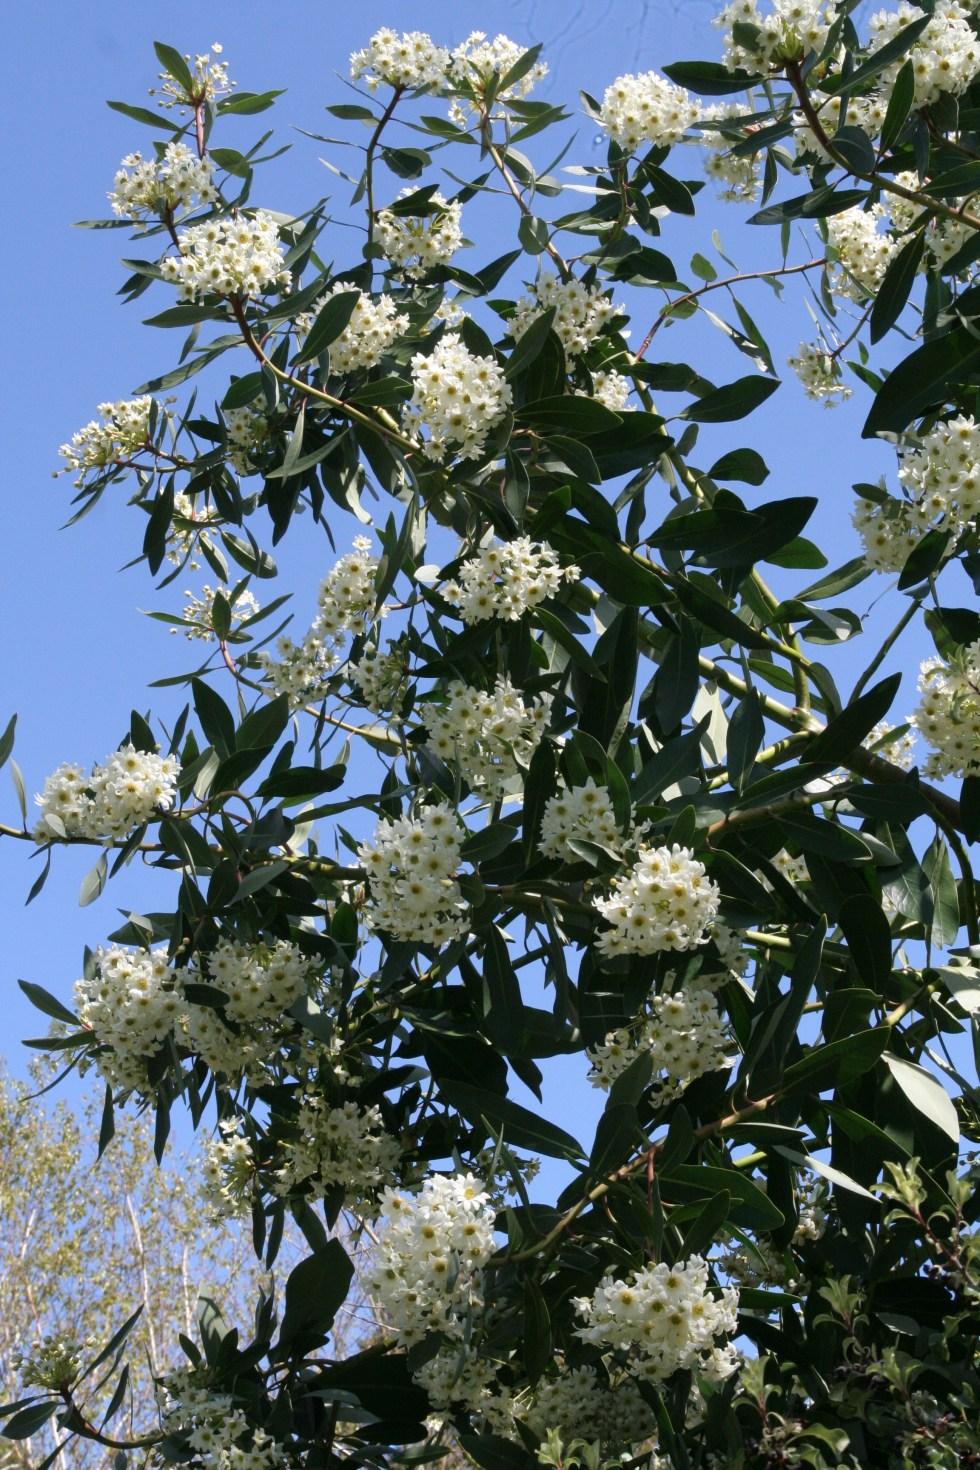 drimys winteri Plant of the week  Drimys winteri